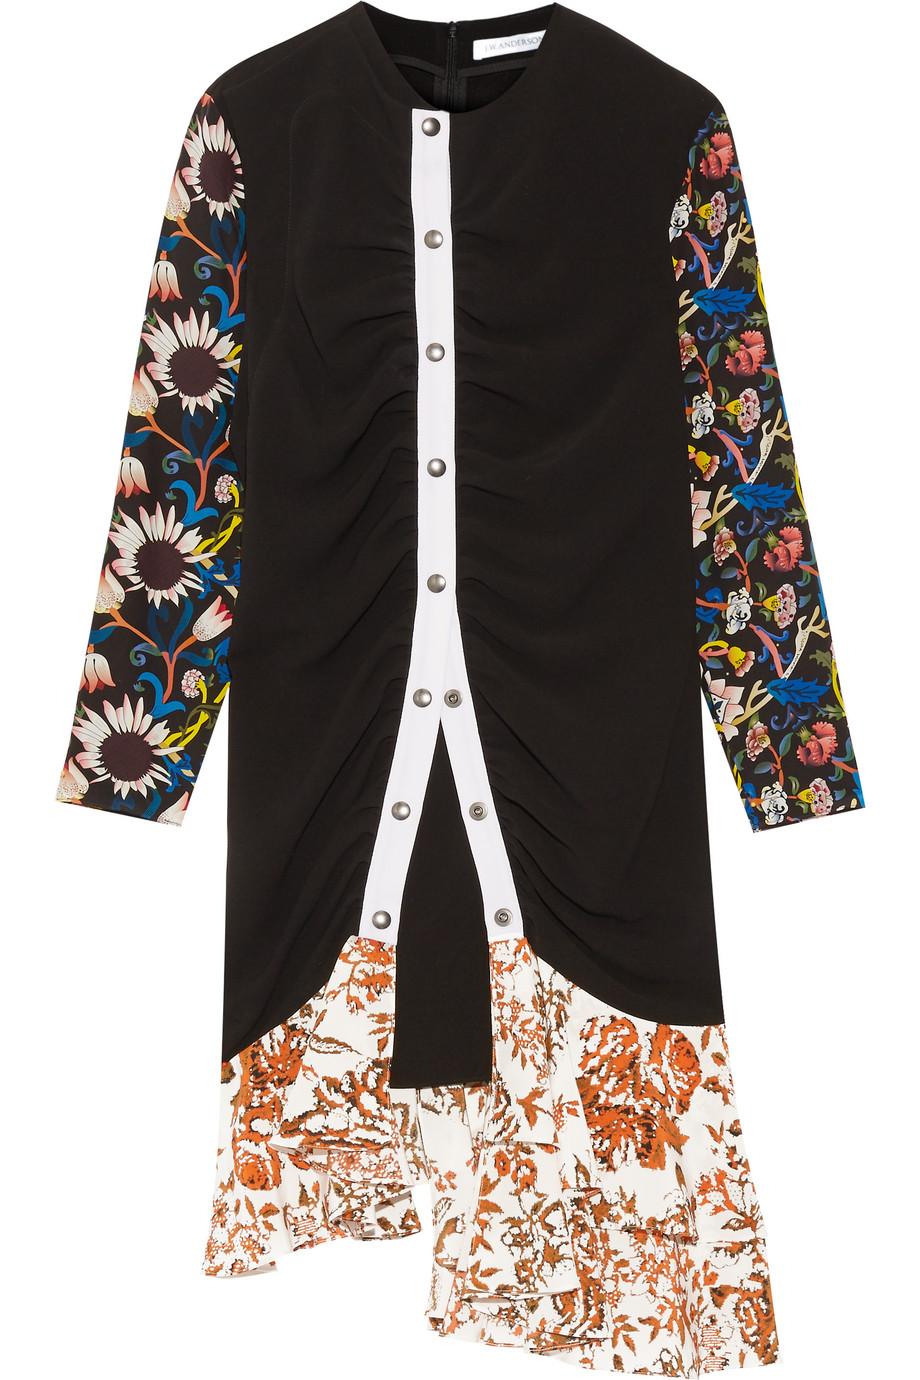 J.W.Anderson Printed Georgette-Paneled Crepe Dress, Black, Women's - Printed, Size: 6